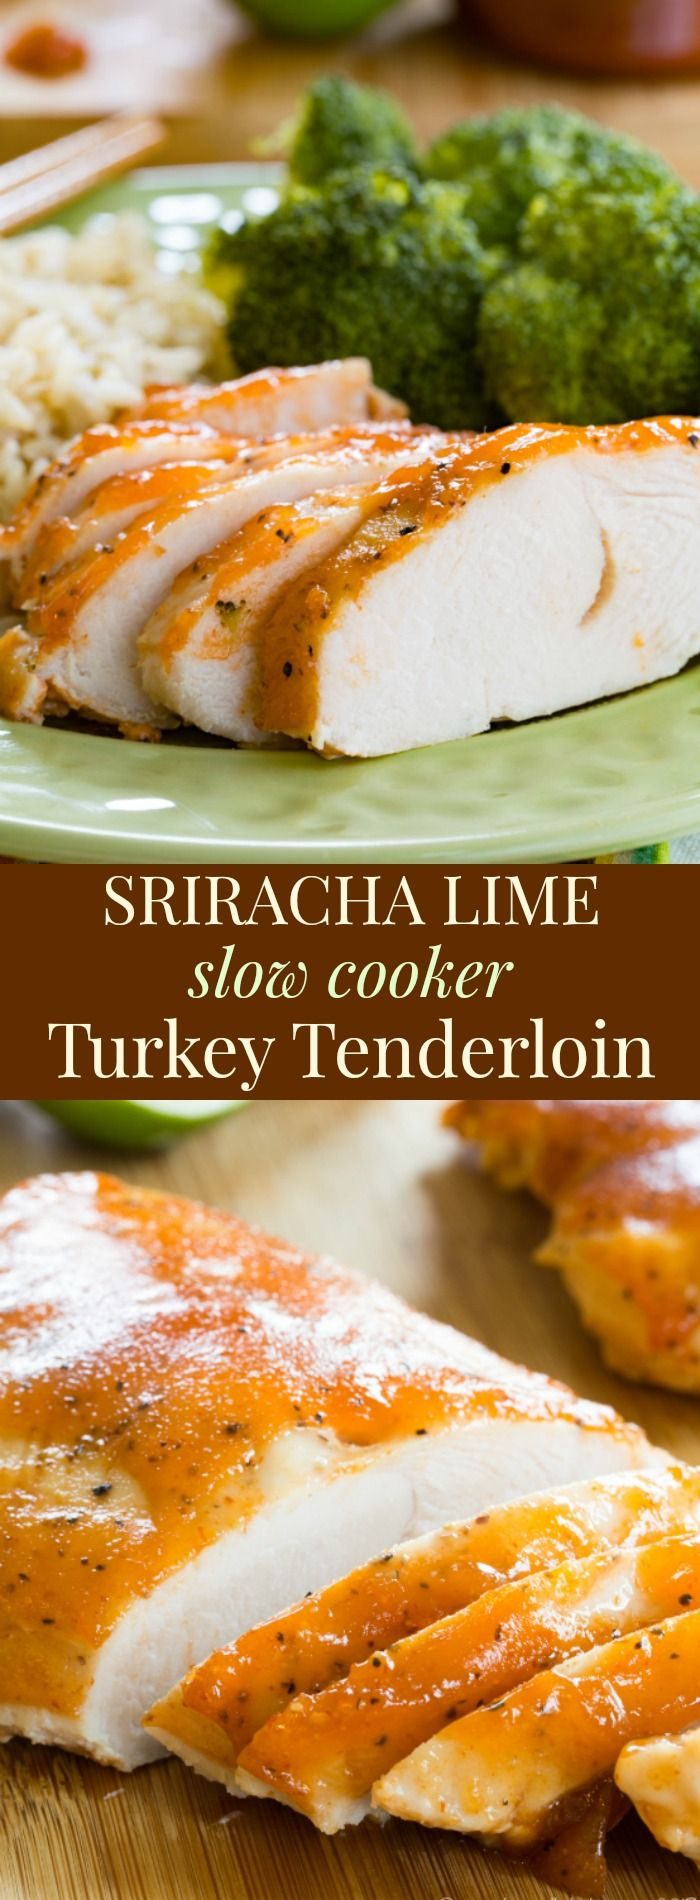 Sriracha lime slow cooker turkey tenderloin recipe turkey sponsored sriracha lime slow cooker turkey tenderloin a sweet and spicy easy dinner recipe forumfinder Images